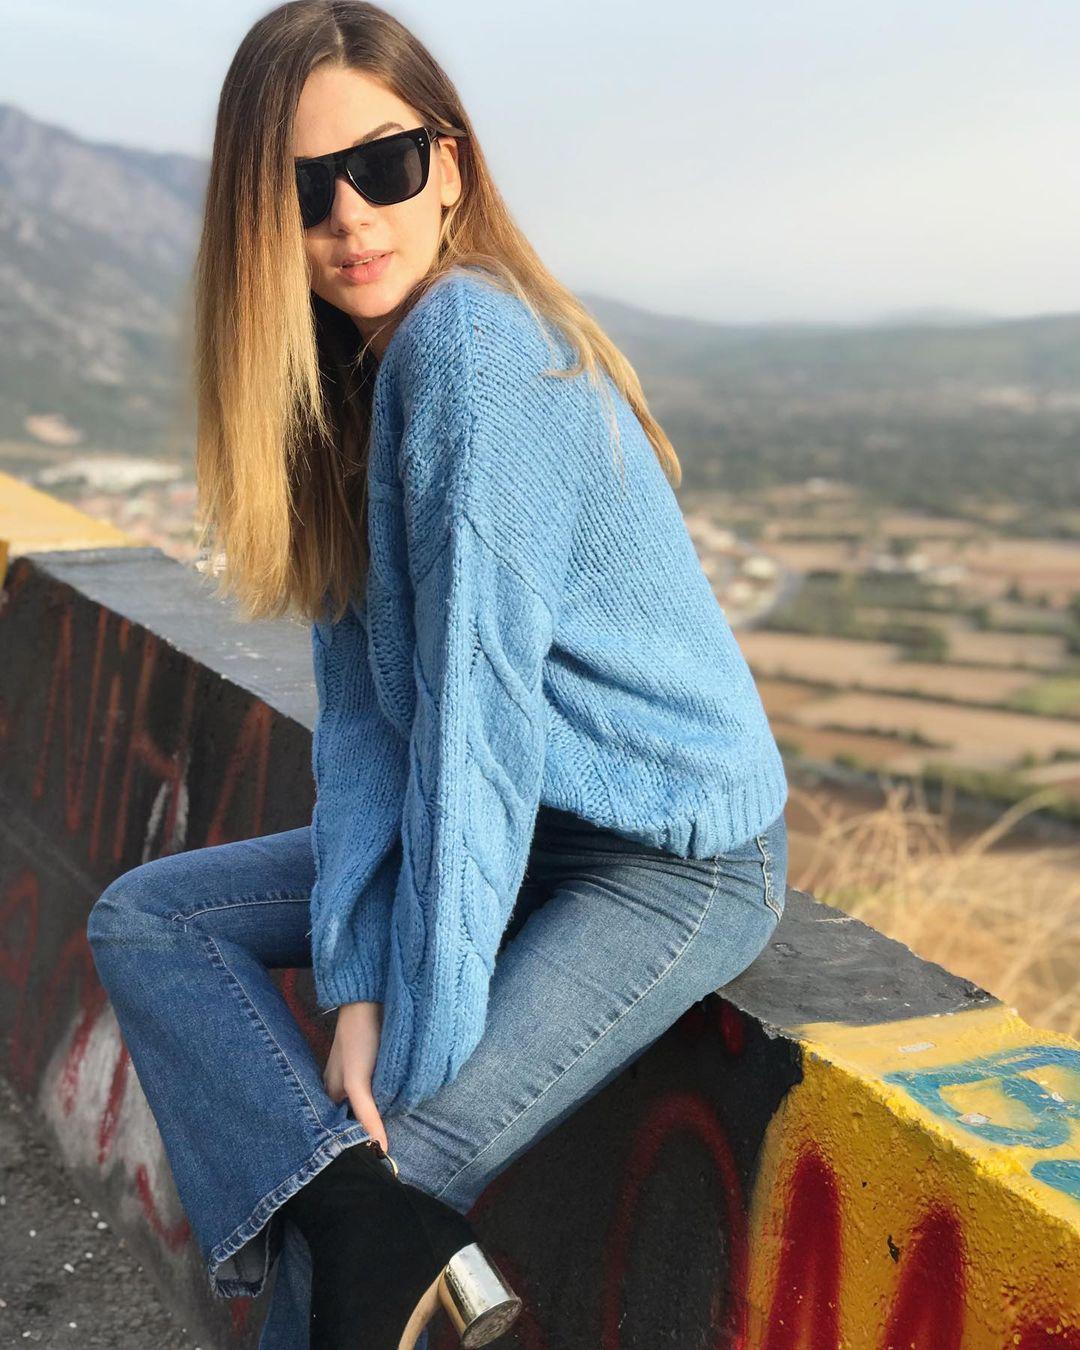 Nursena-Ozcanli-Wallpapers-Insta-Fit-Bio-4